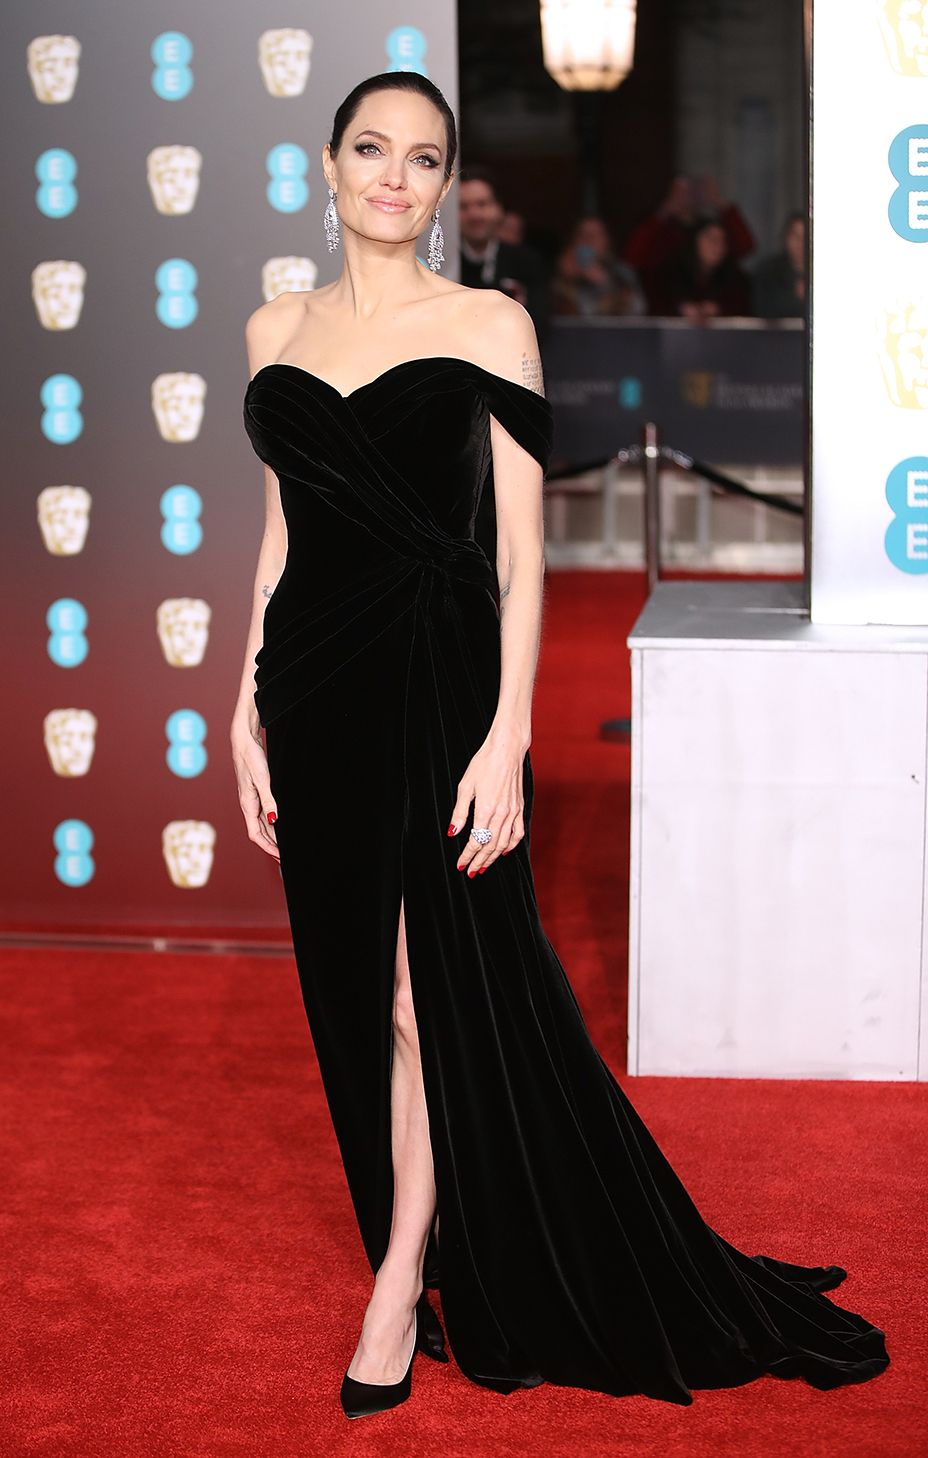 Top 12 Best Dressed At The 2018 Baftas Nice Dresses Dresses Angelina Jolie Dress